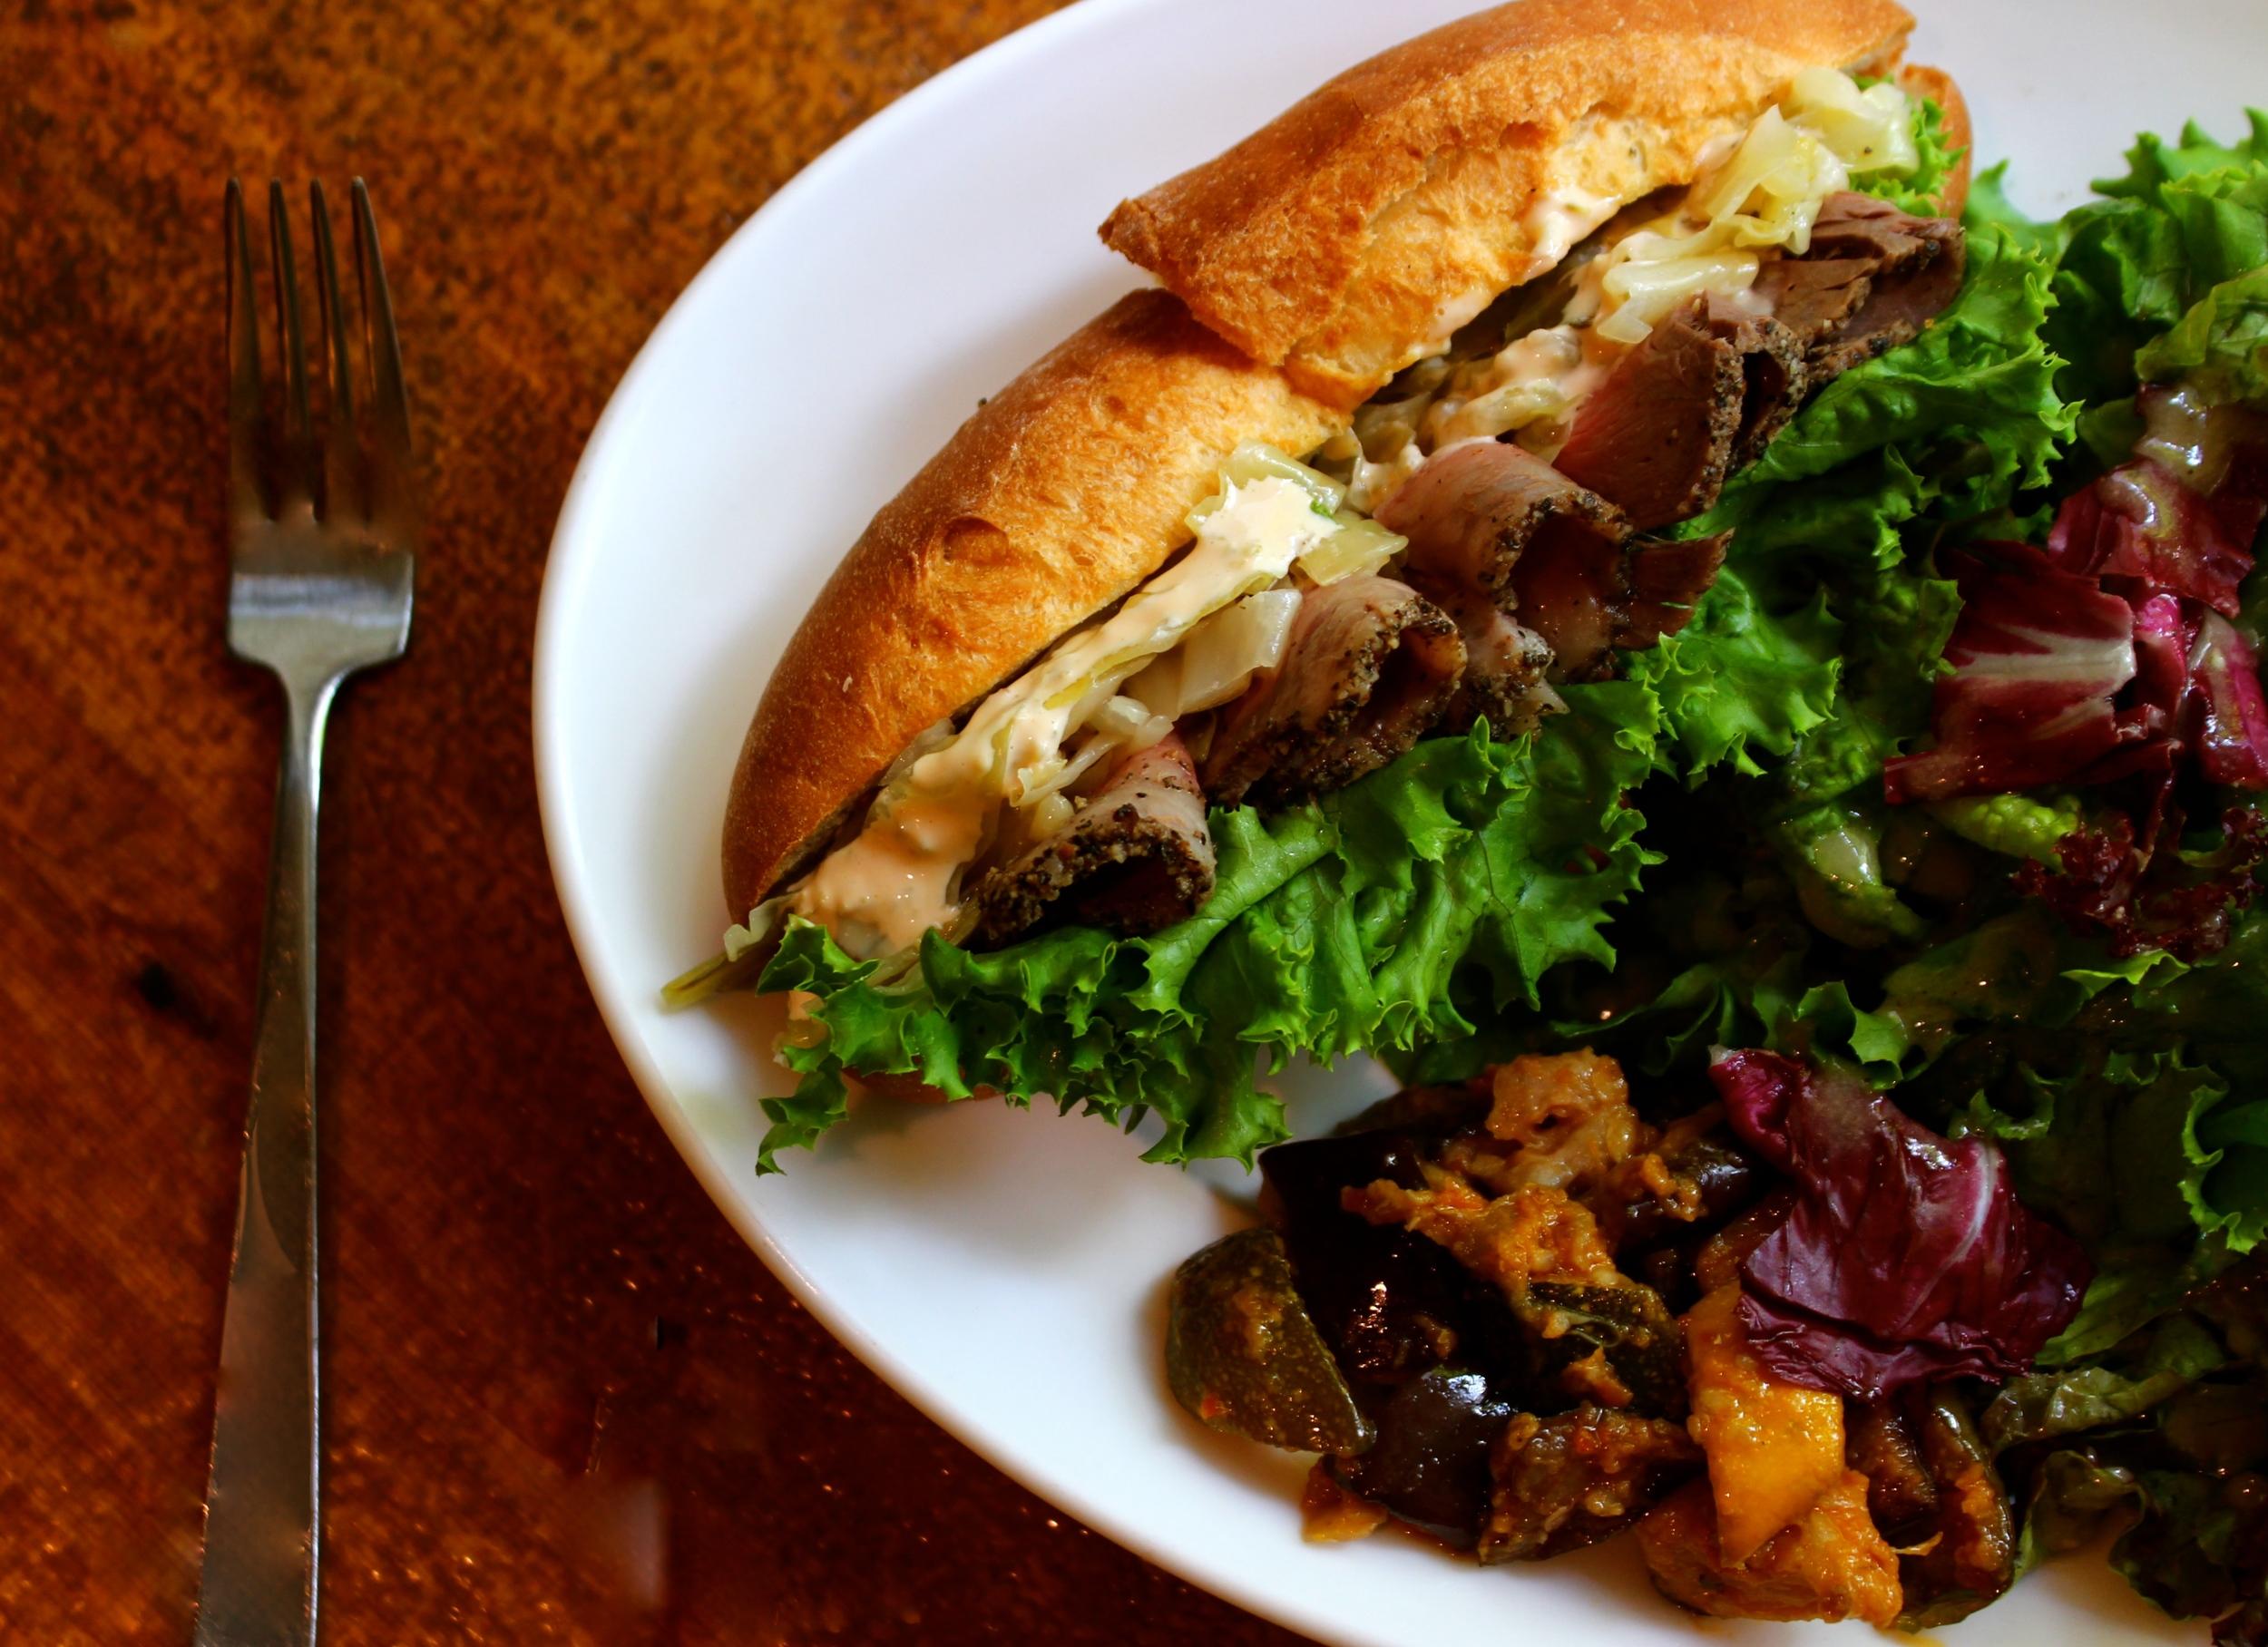 8th Anniversary Special menu : Soft-Baguette Sandwich with Beef Pastrami & Sauerkraut.